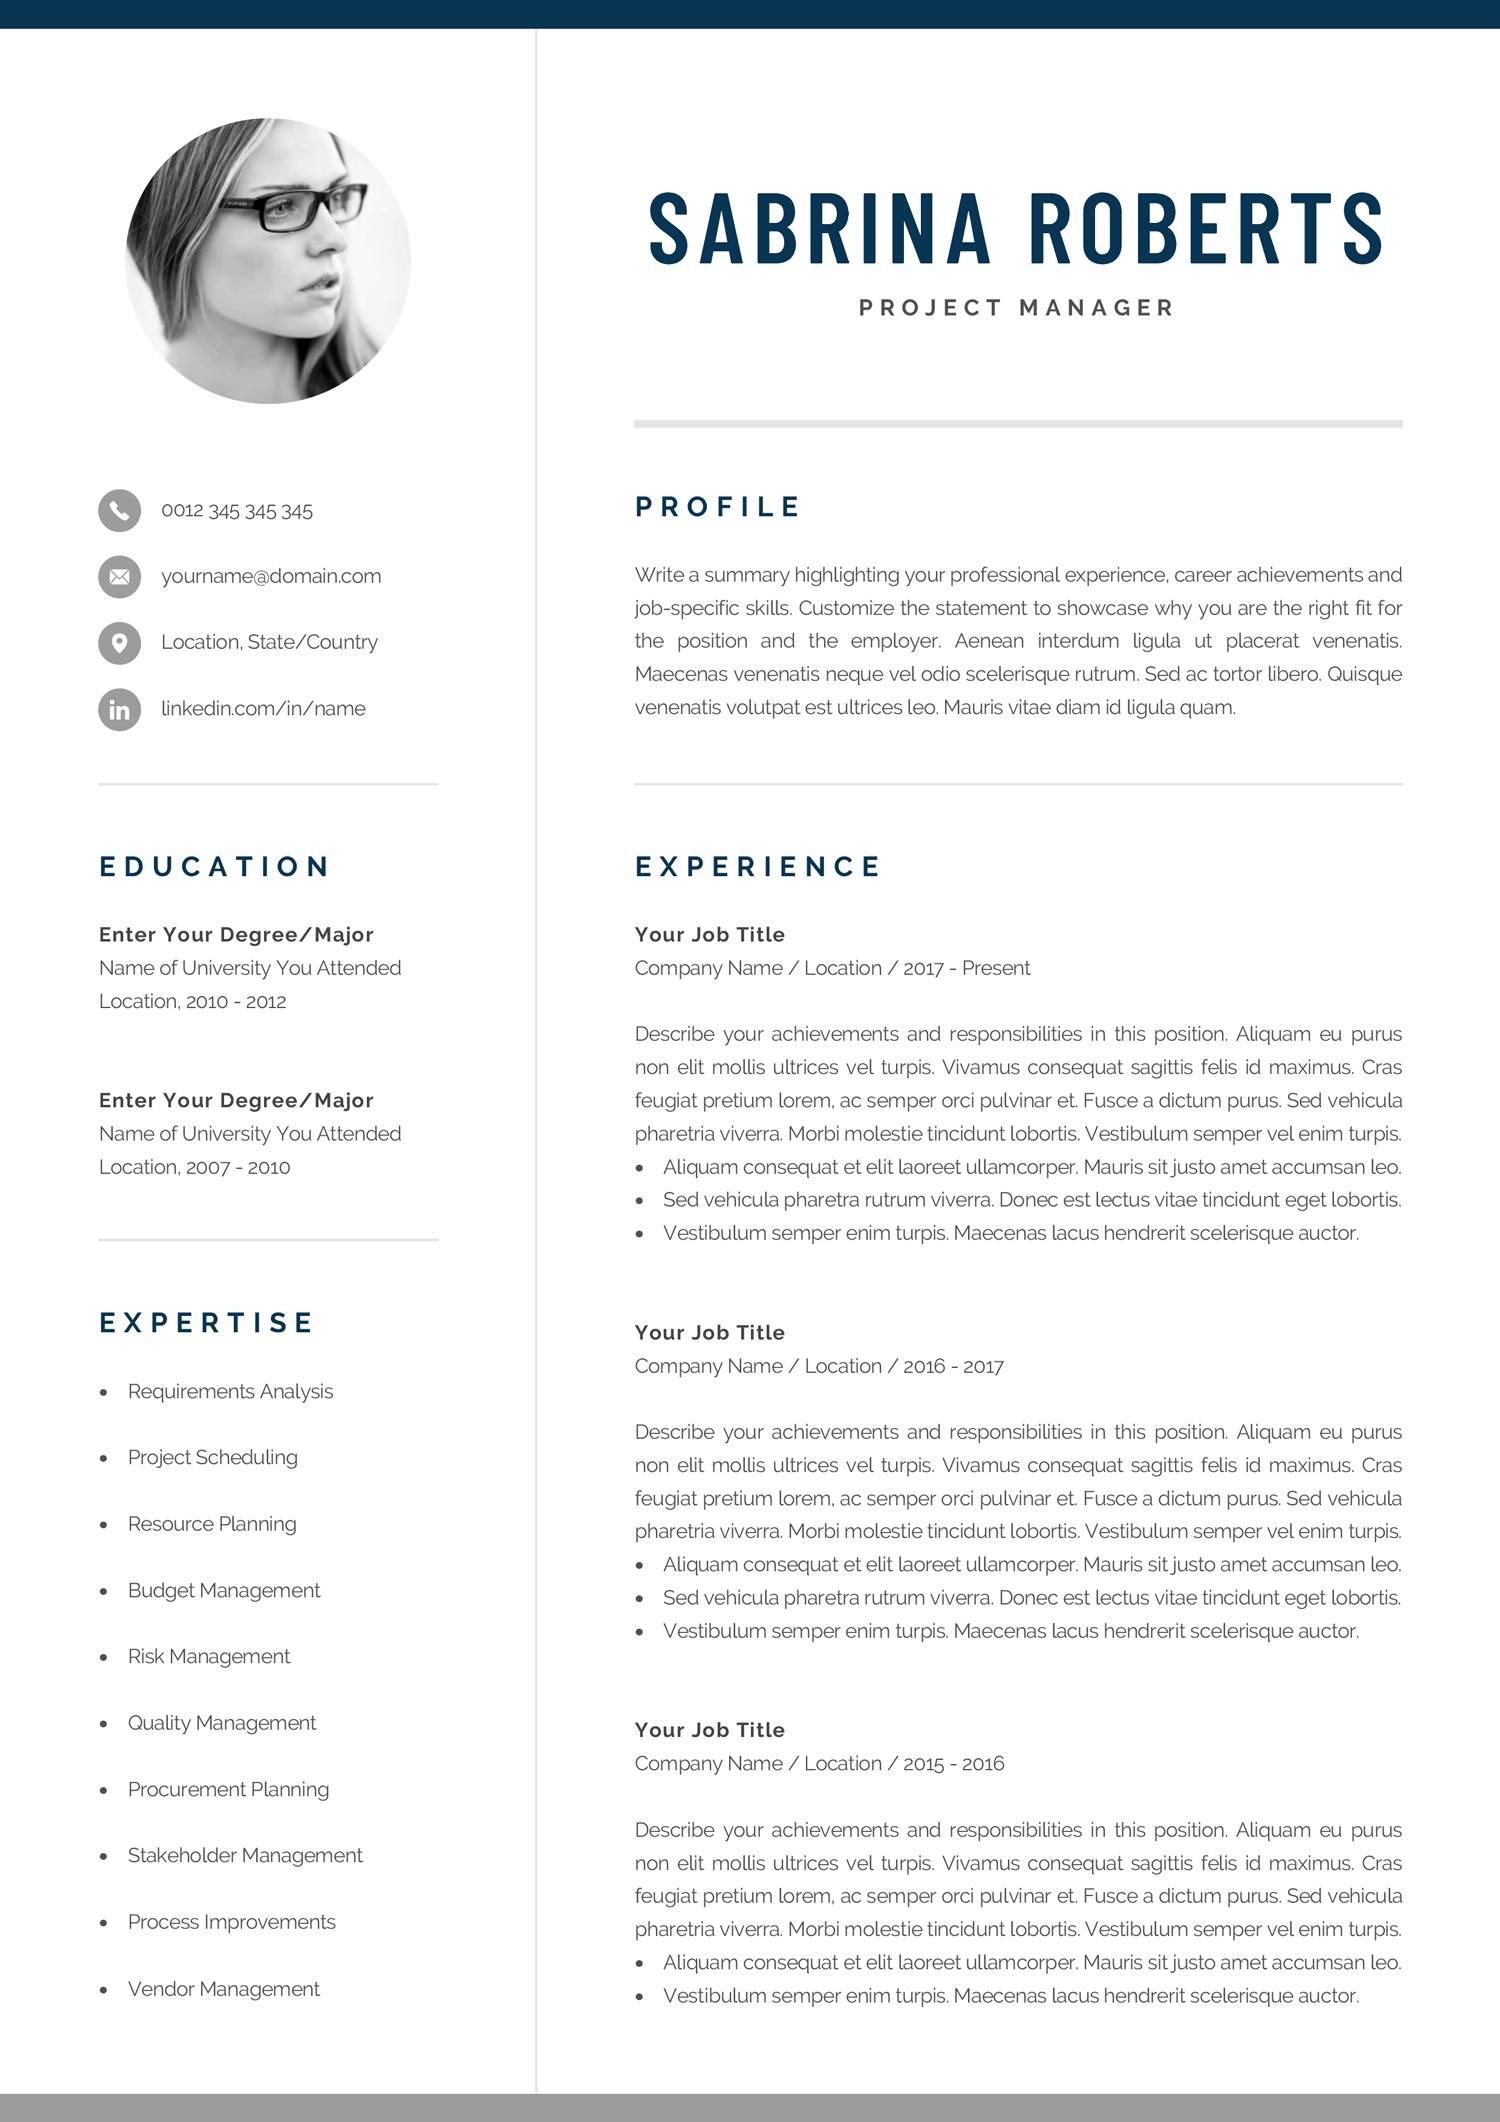 Resume Template Professional Resume Cv Template Modern Resume Resume Template Word Creative Resume Design Manager Cv Sabrina Resume Template Professional Resume Template Resume Template Word